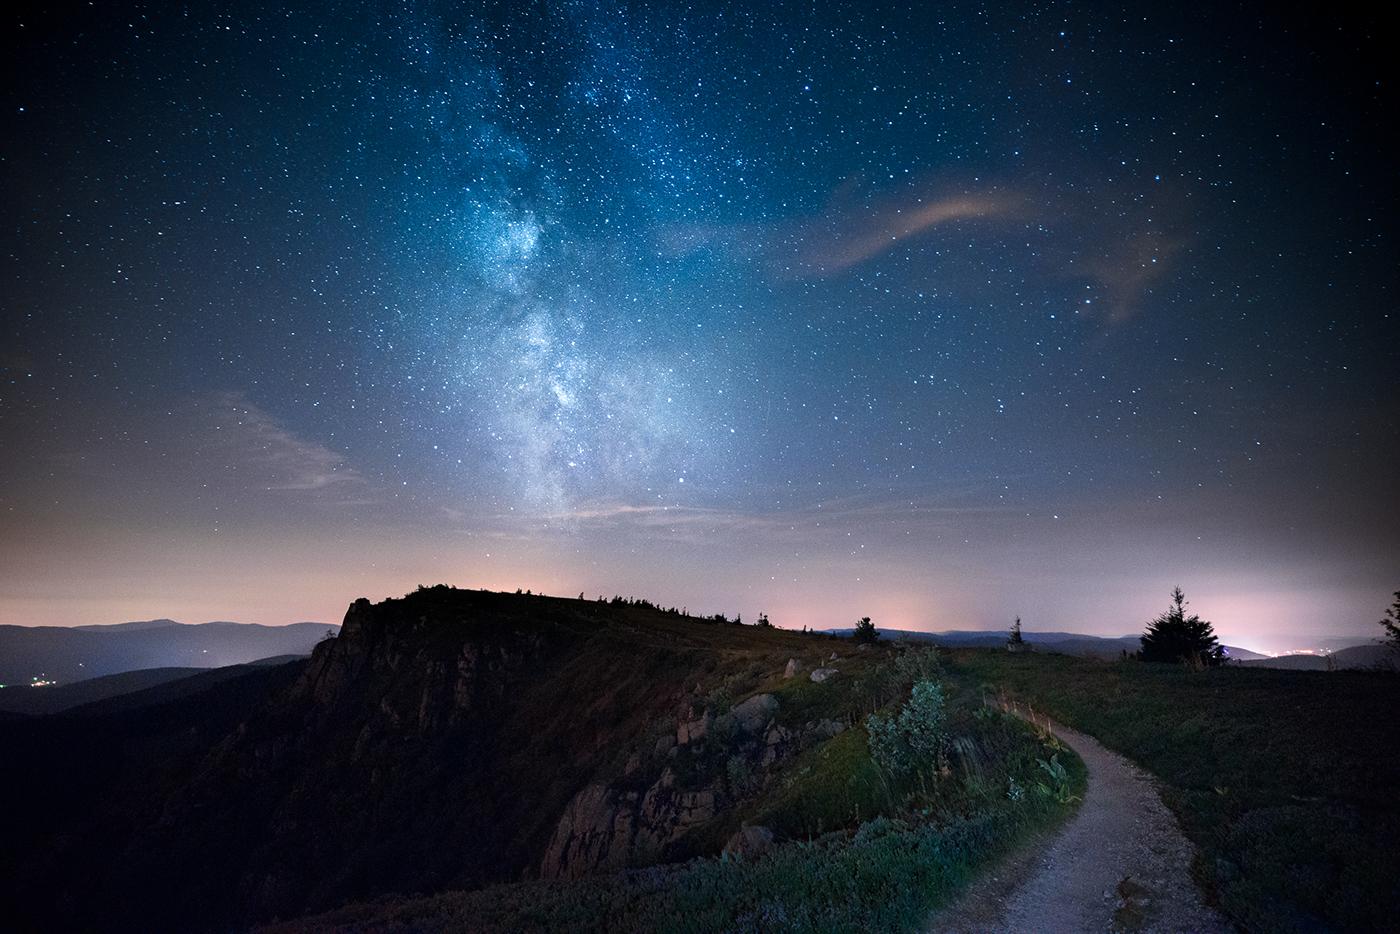 nightscapes Landscape milkyway stars night Vosges france longexposure Nikon